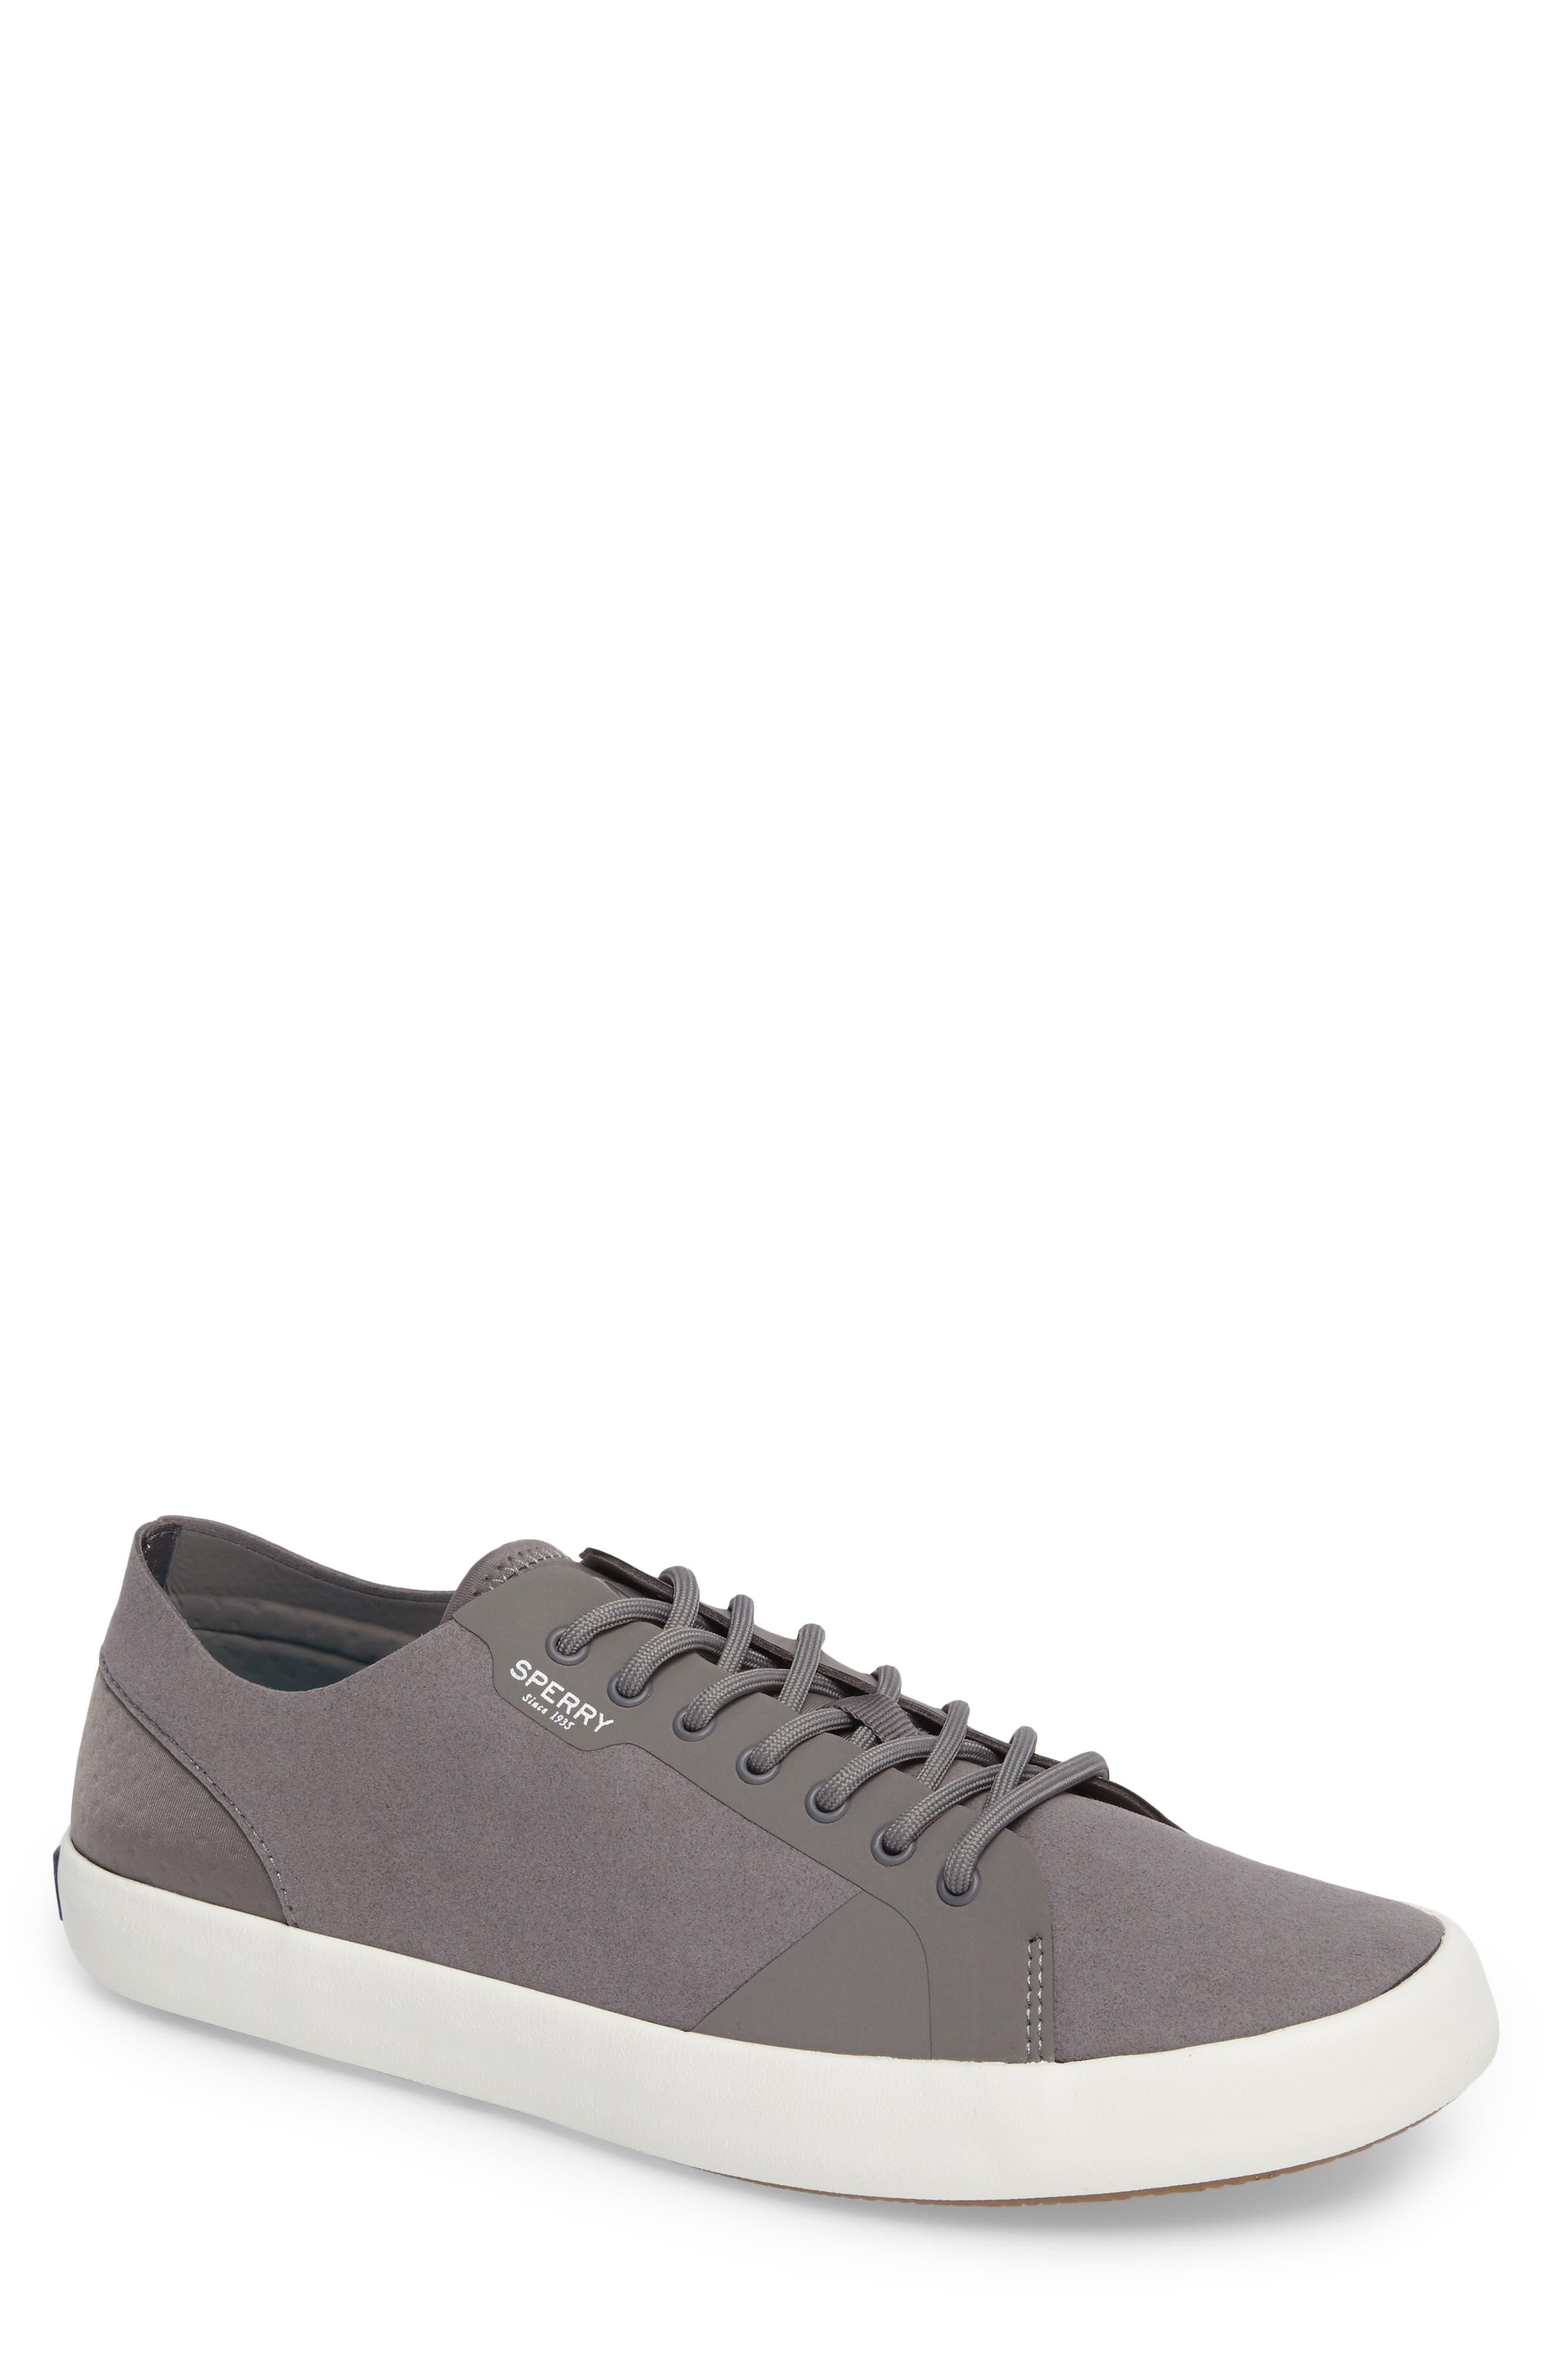 Flex Deck LTT Sneaker,                             Main thumbnail 1, color,                             Grey